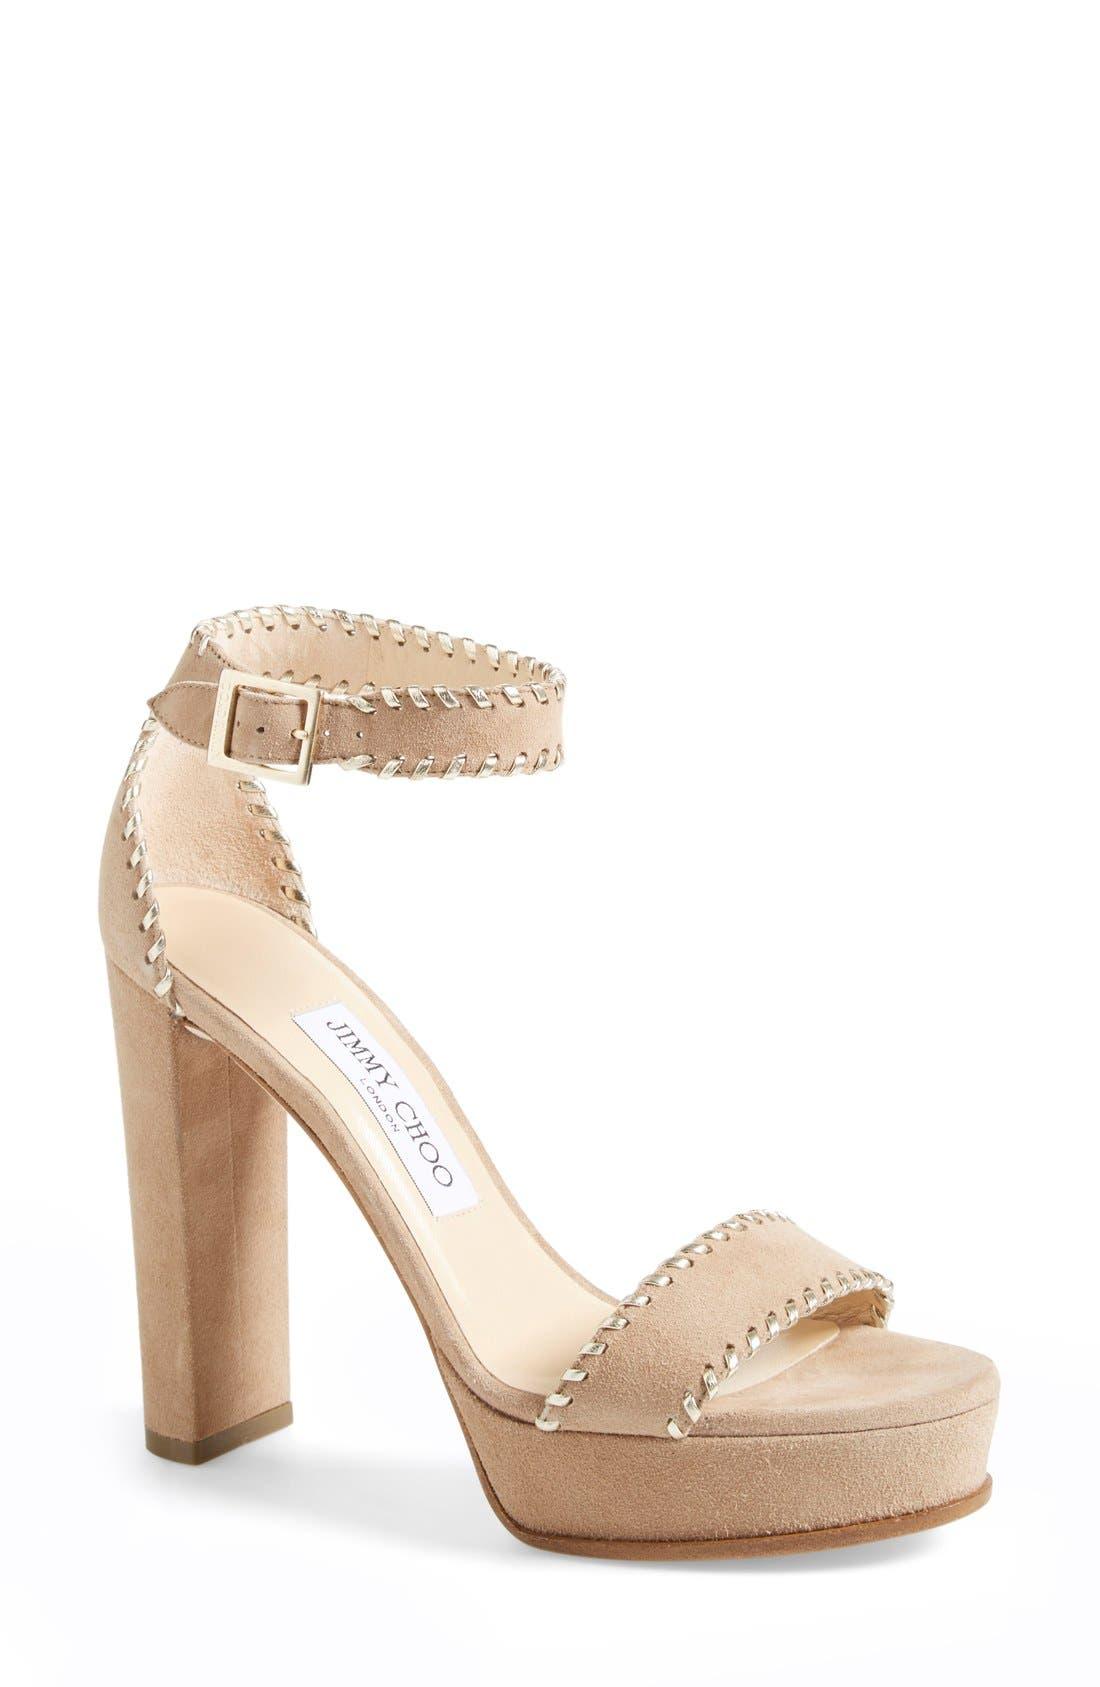 Alternate Image 1 Selected - Jimmy Choo 'Holly' Sandal (Women)